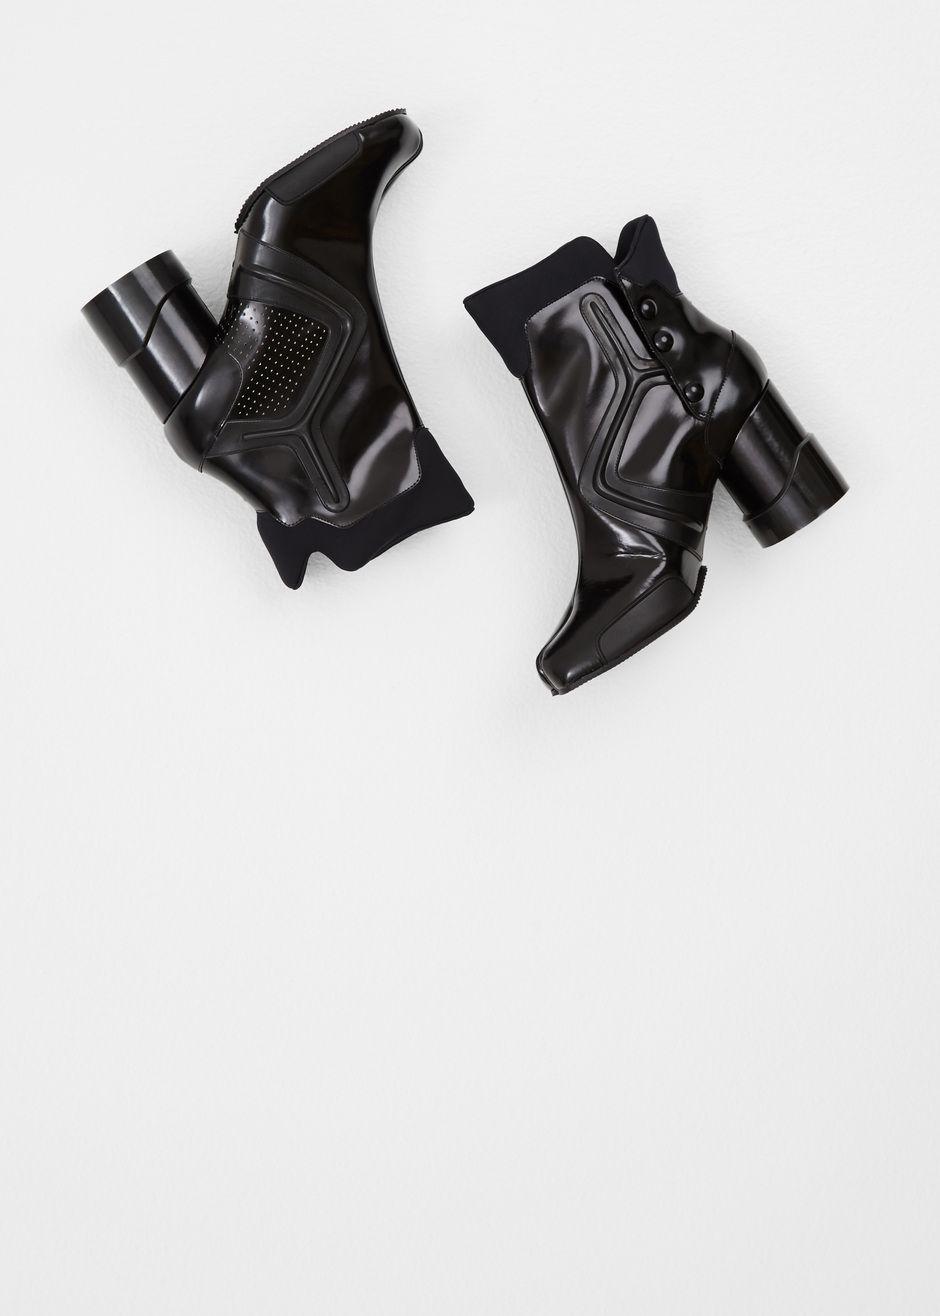 fbf0fb896c9 Maison Martin Margiela Perforated Techno Tabi Boot (Black ...